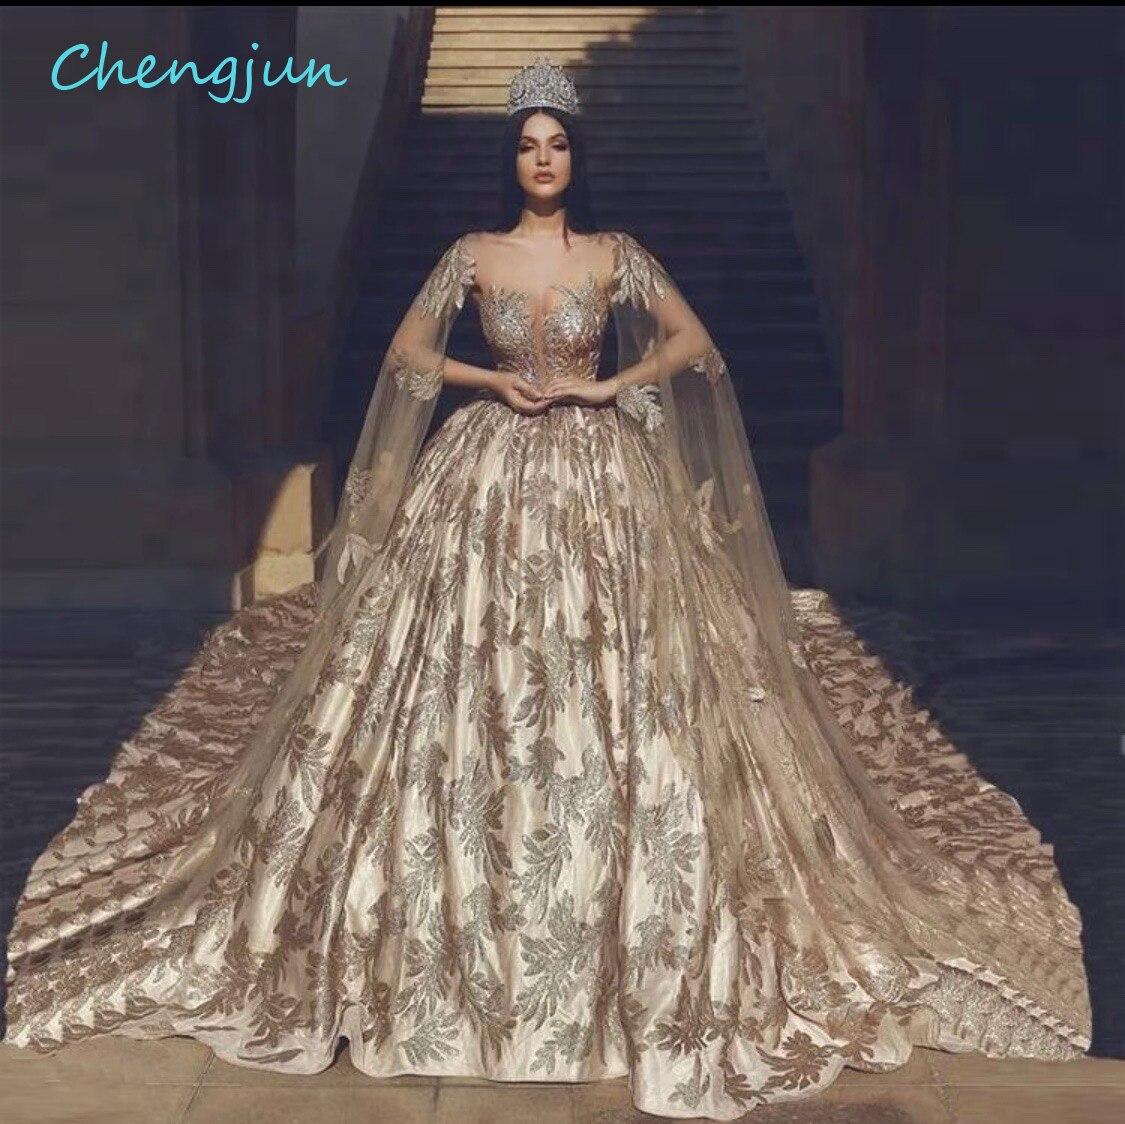 Chengjun-ثوب كرة ذهبي للنساء ، قمصان علوية شفافة ، دانتيل مثير ، فستان زفاف فاخر بأكمام